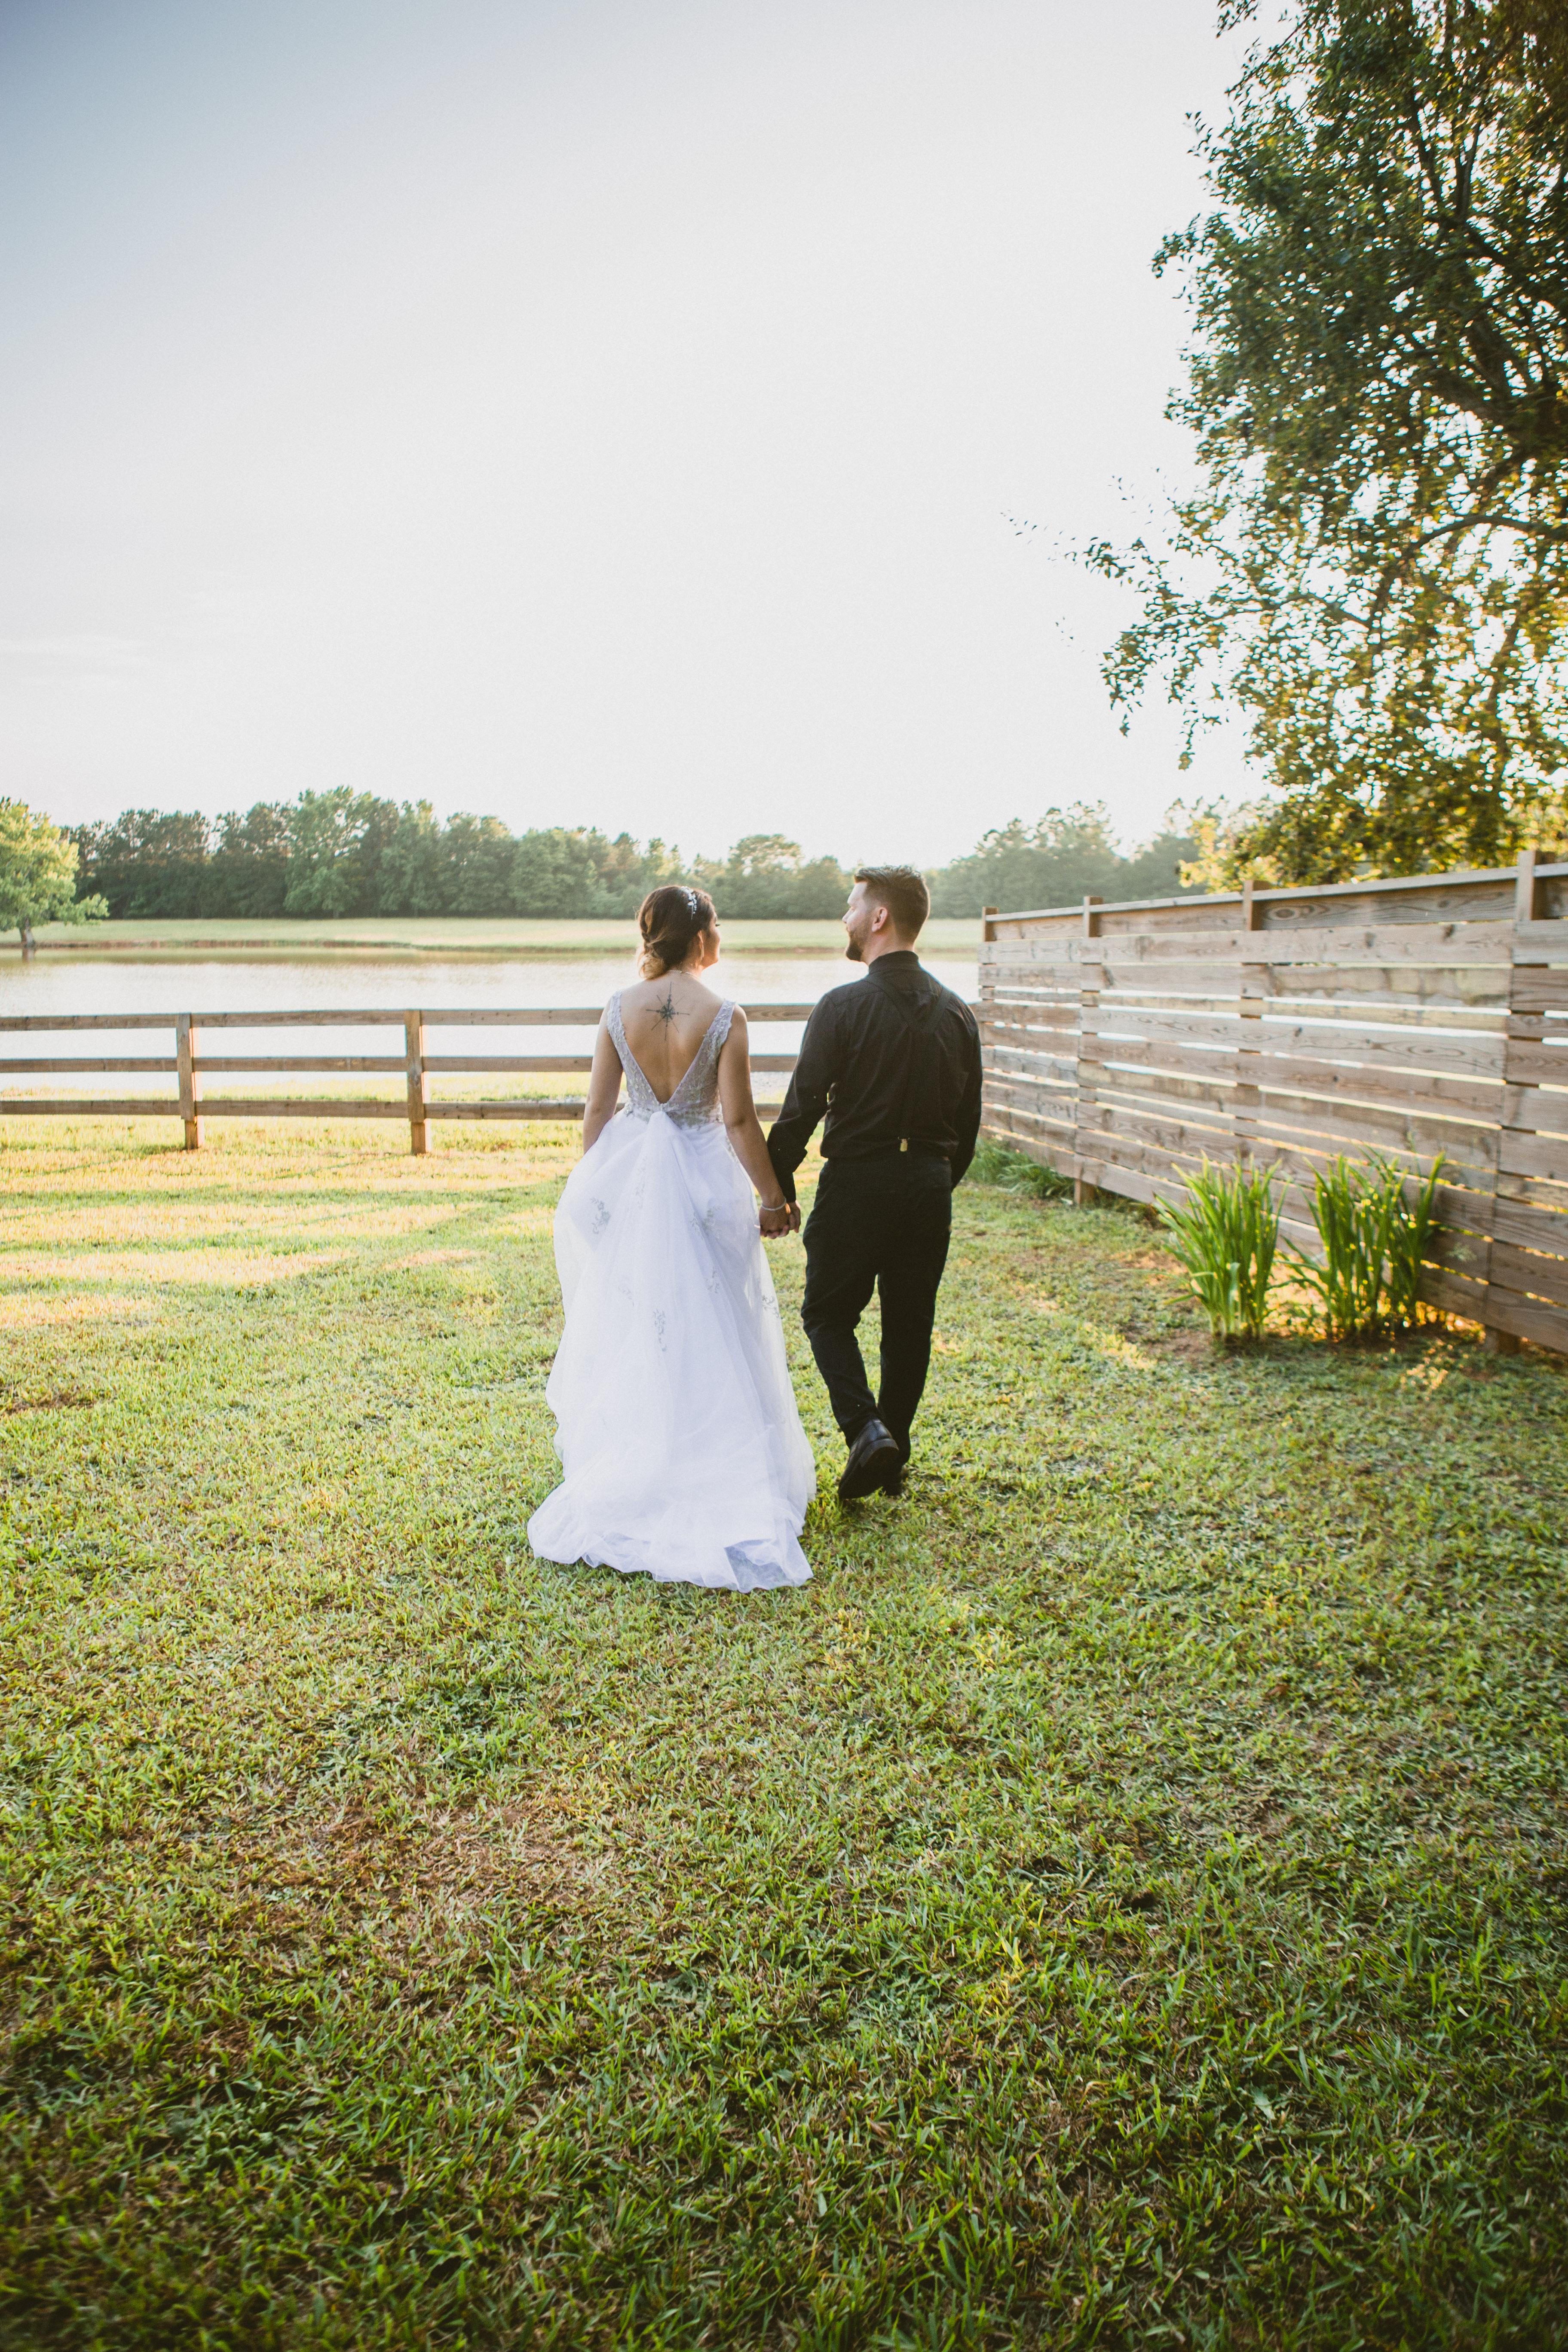 Adam & Mercedies // The Rivers Ranch, GA